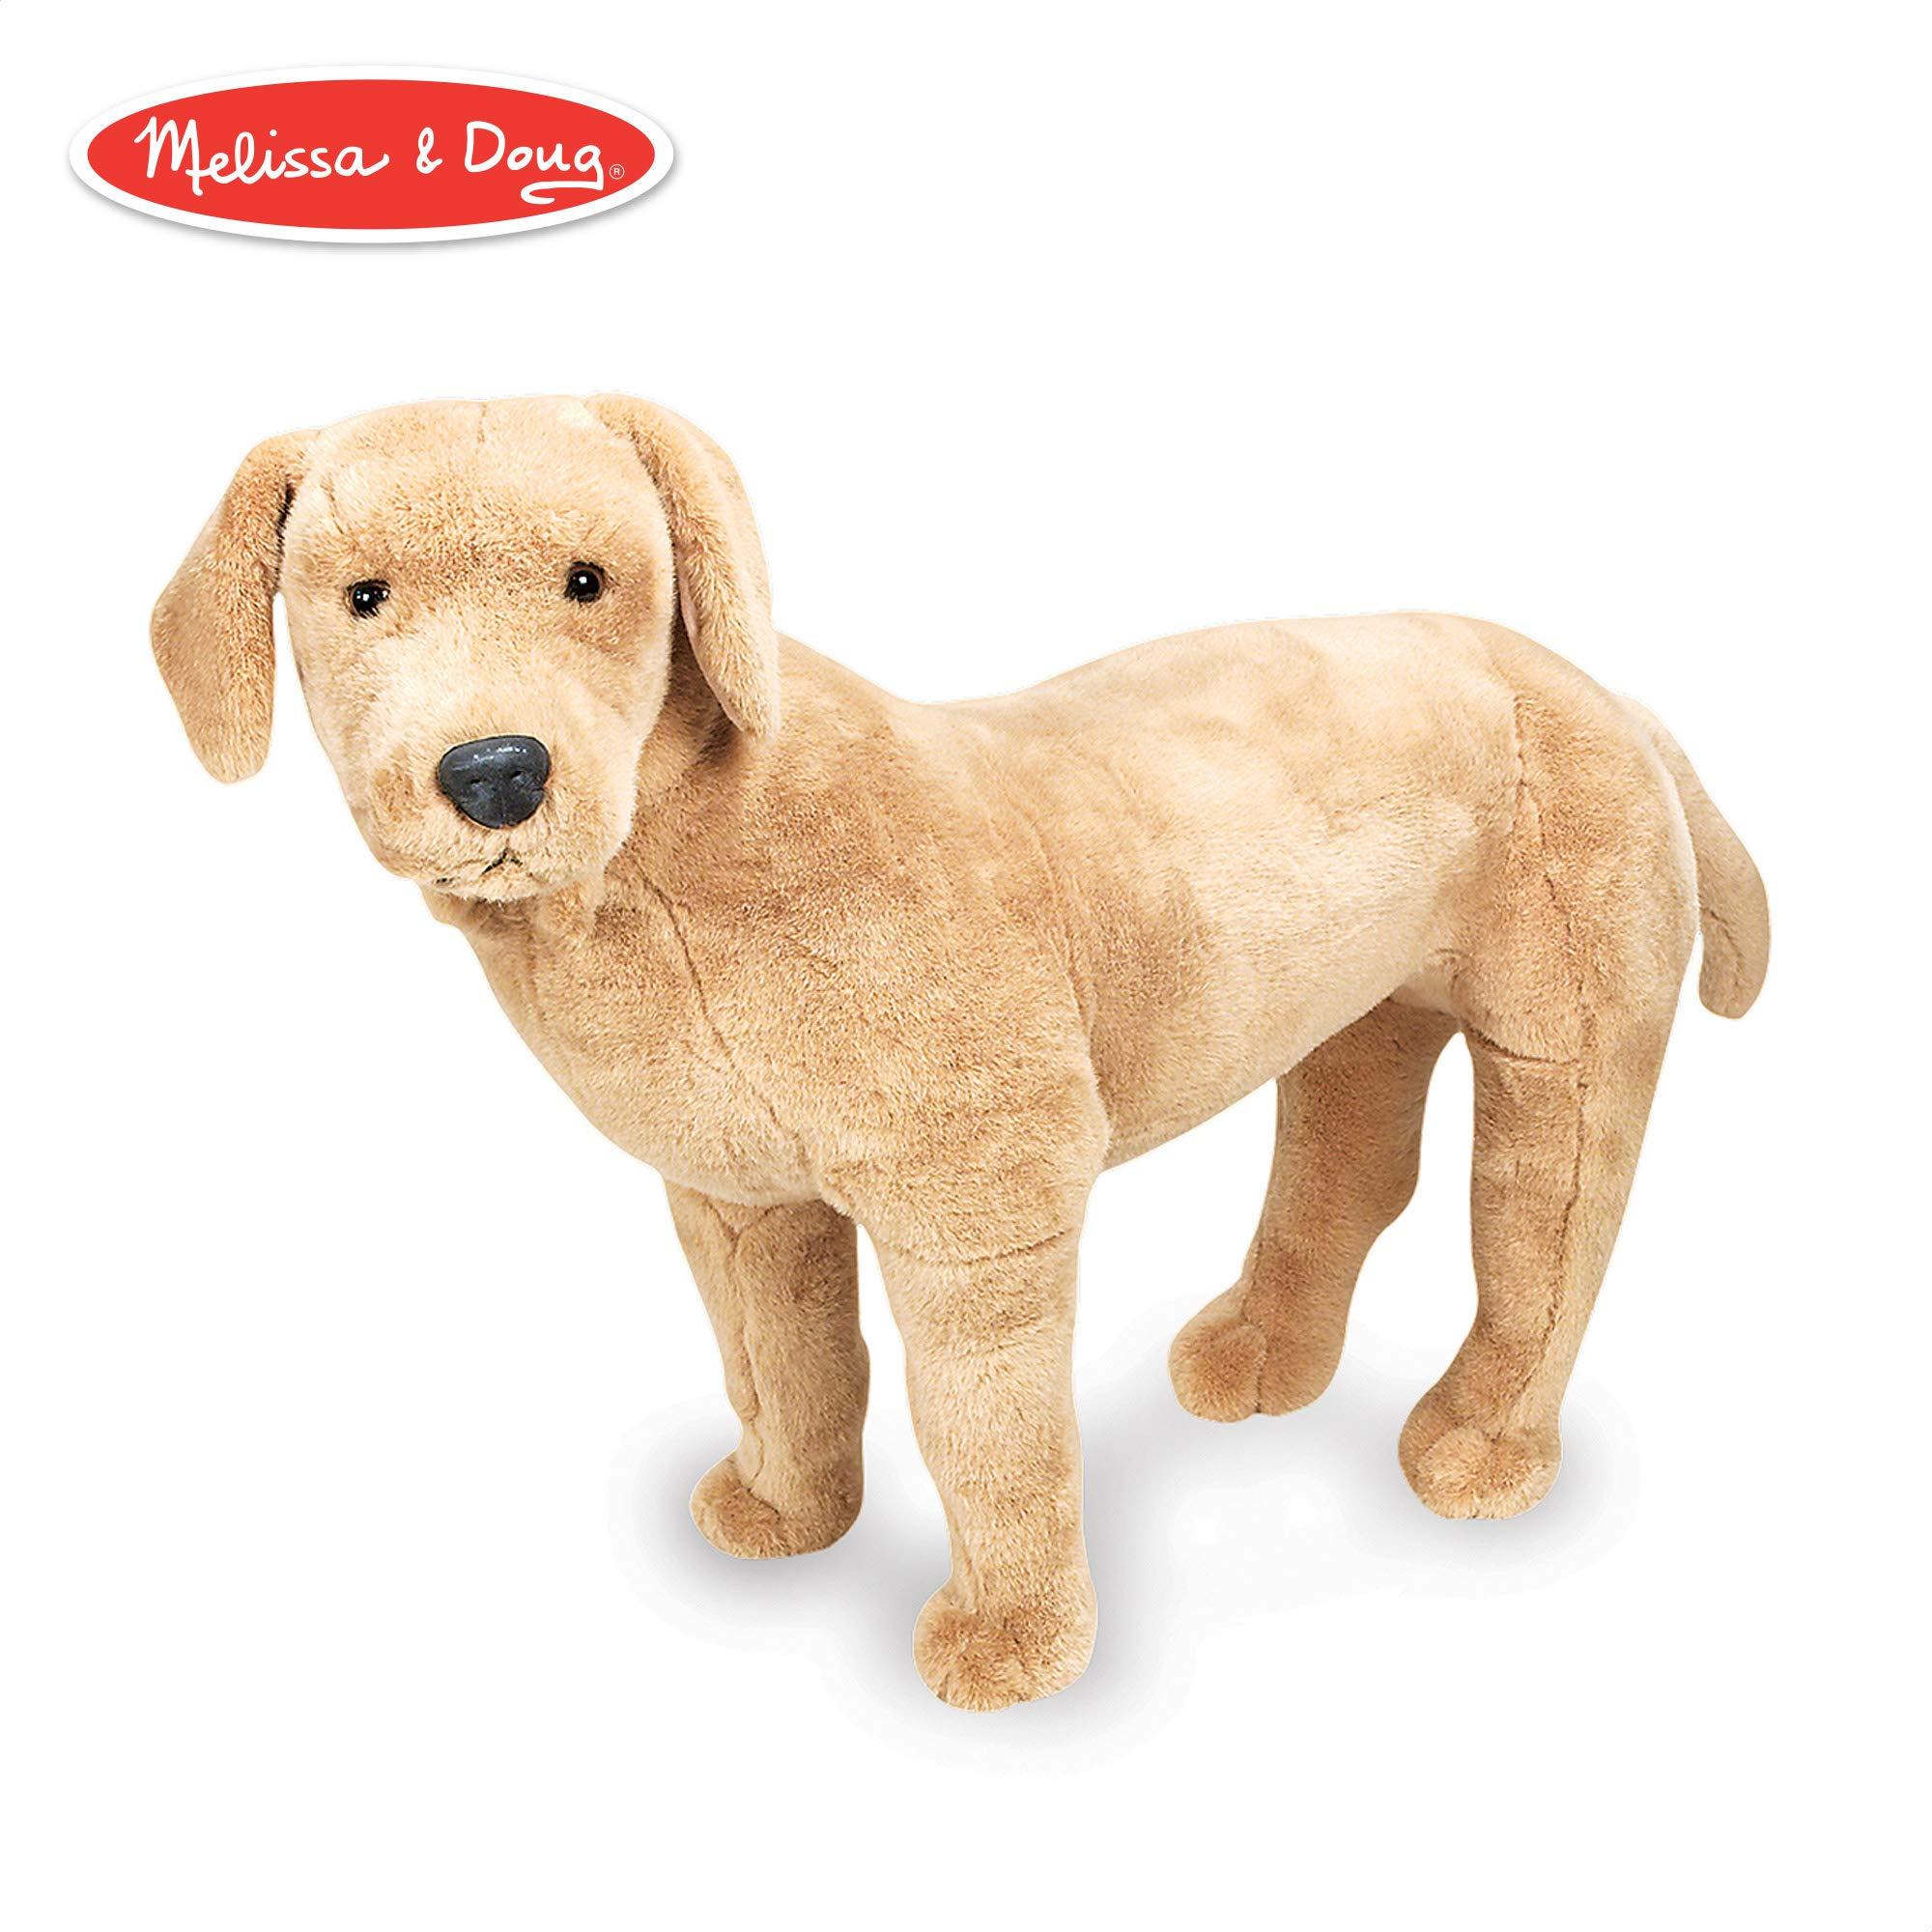 Melissa & Doug Giant Yellow Labrador - Lifelike Stuffed Animal Dog (nearly 2 feet tall) by Melissa & Doug